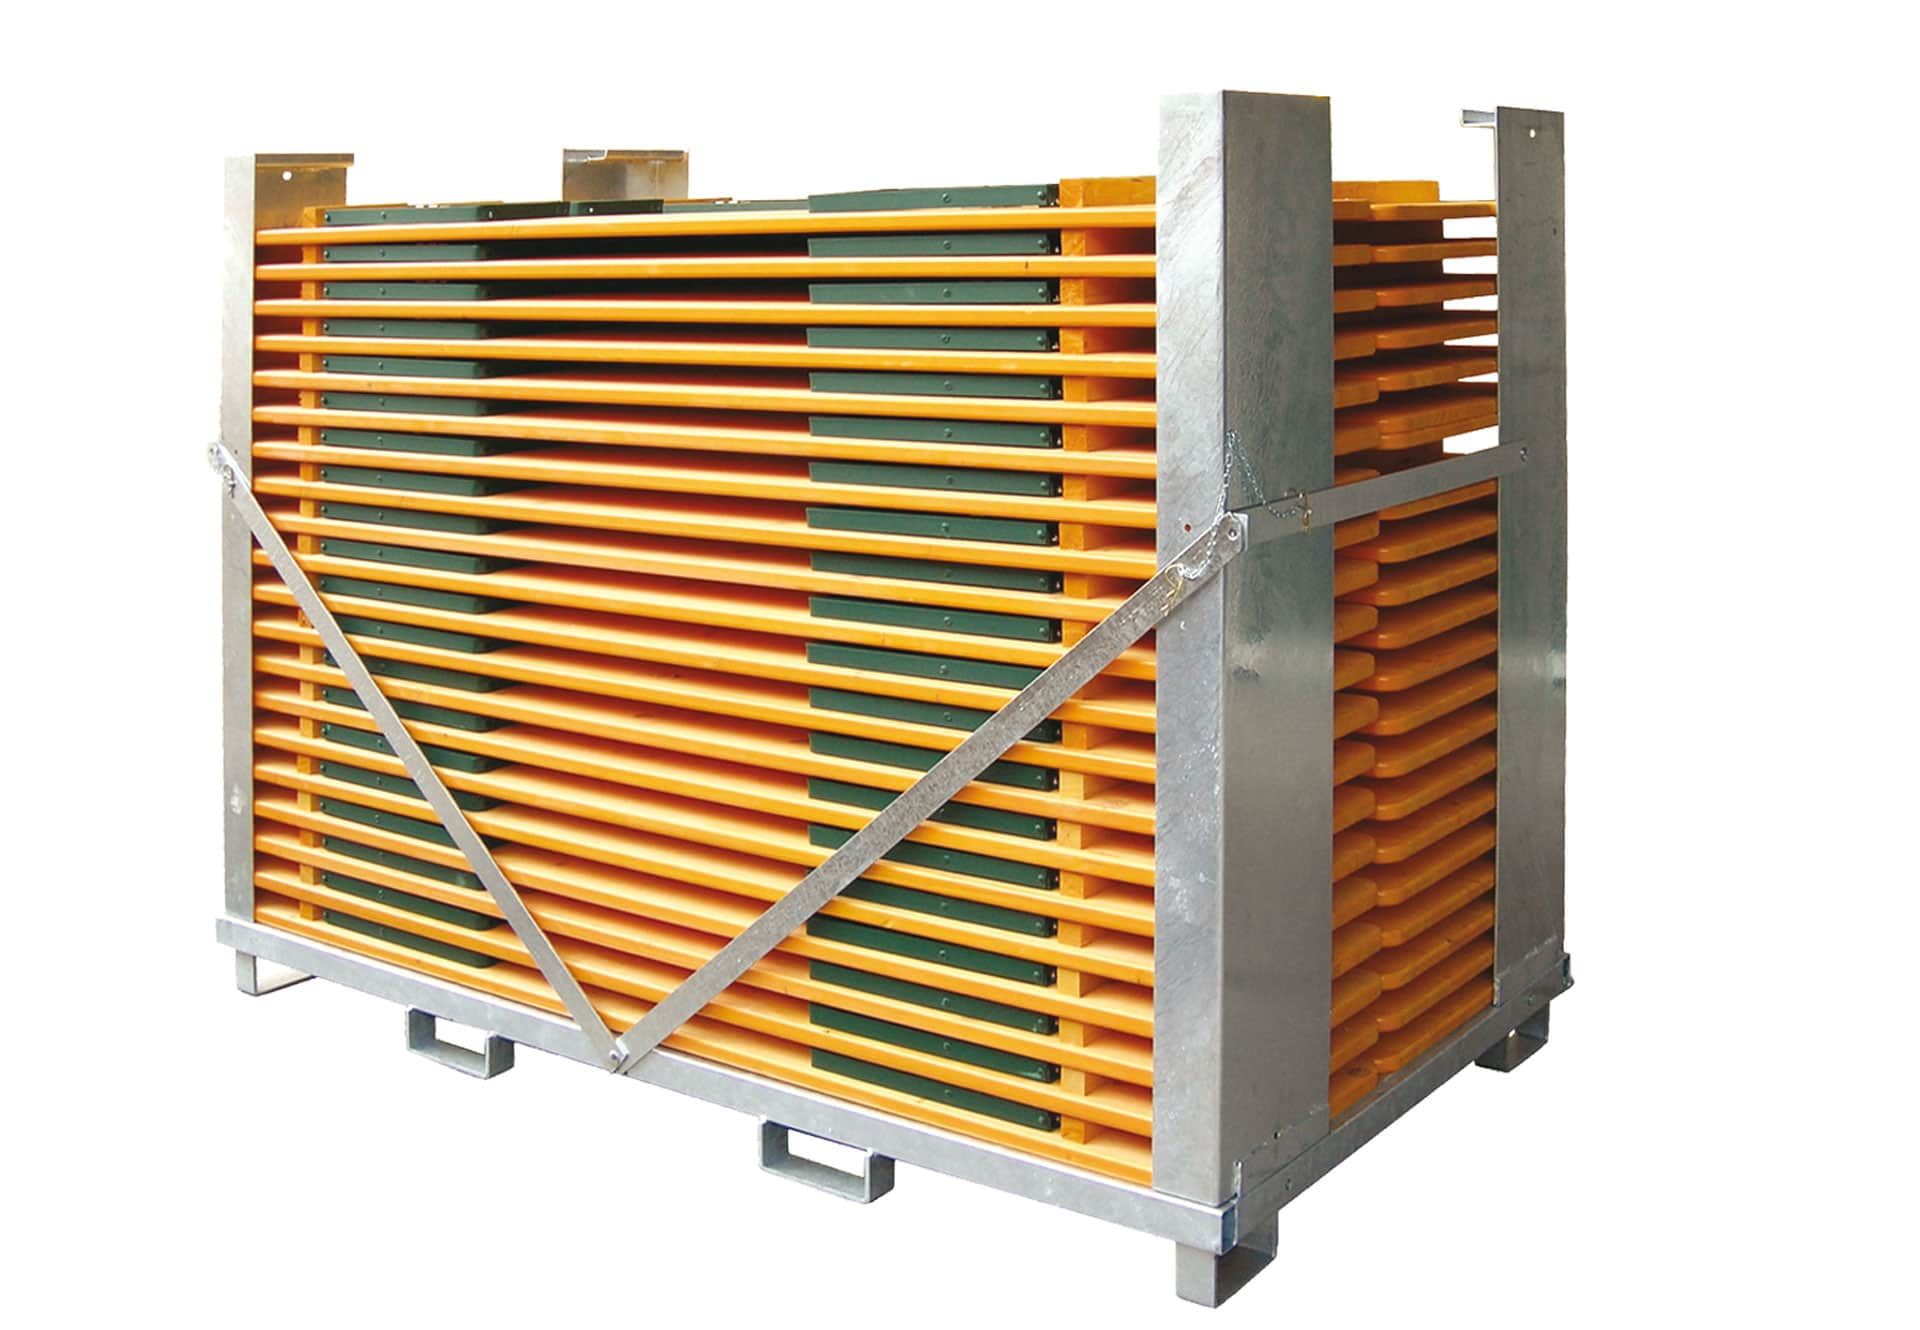 Klapptische & Klappbänke - Container 01